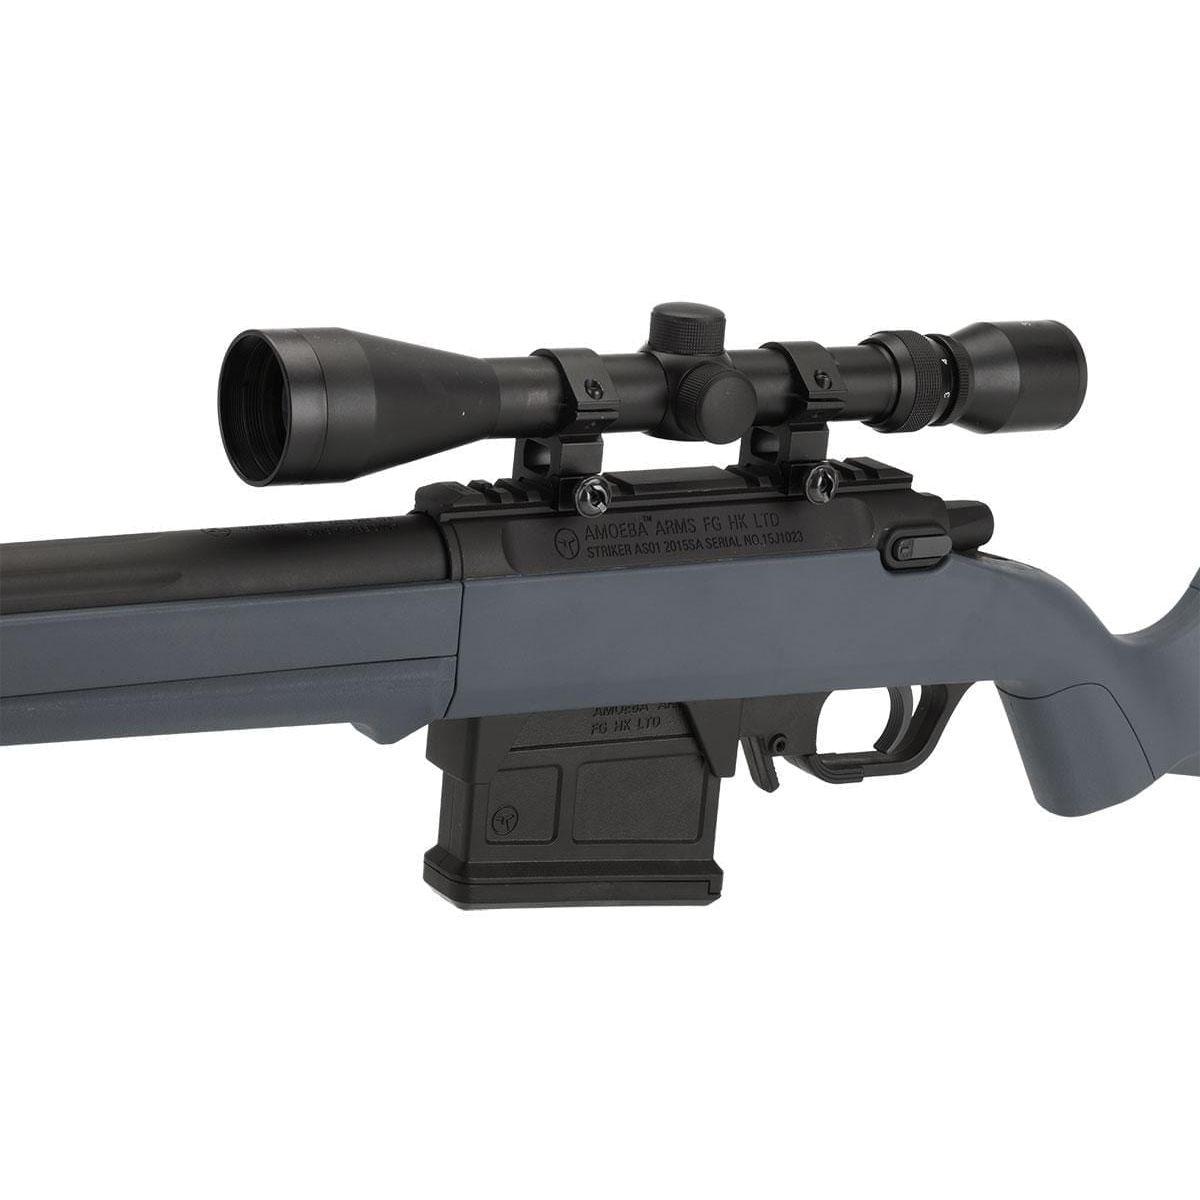 S1 Gen2 Bolt Action Sniper Rifle amoeba